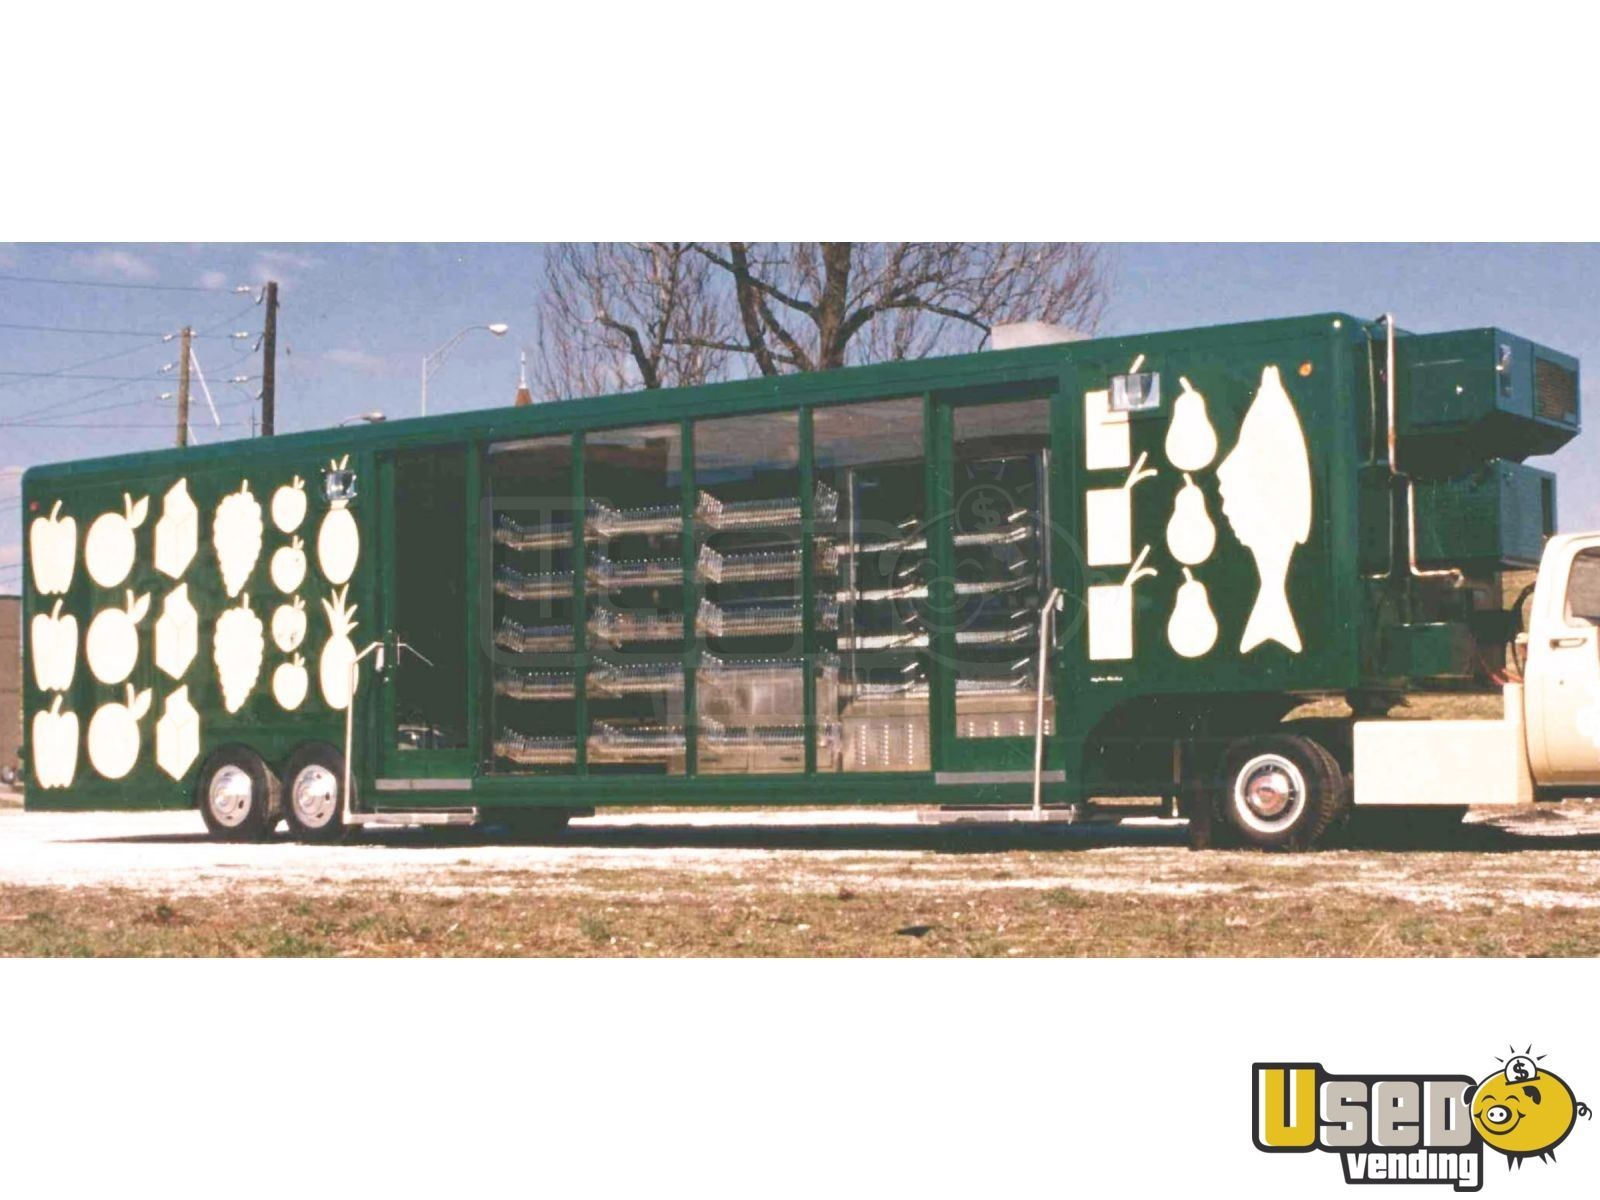 38 39 mobile grocery convenience store marketing trailer for Mobili convenienti